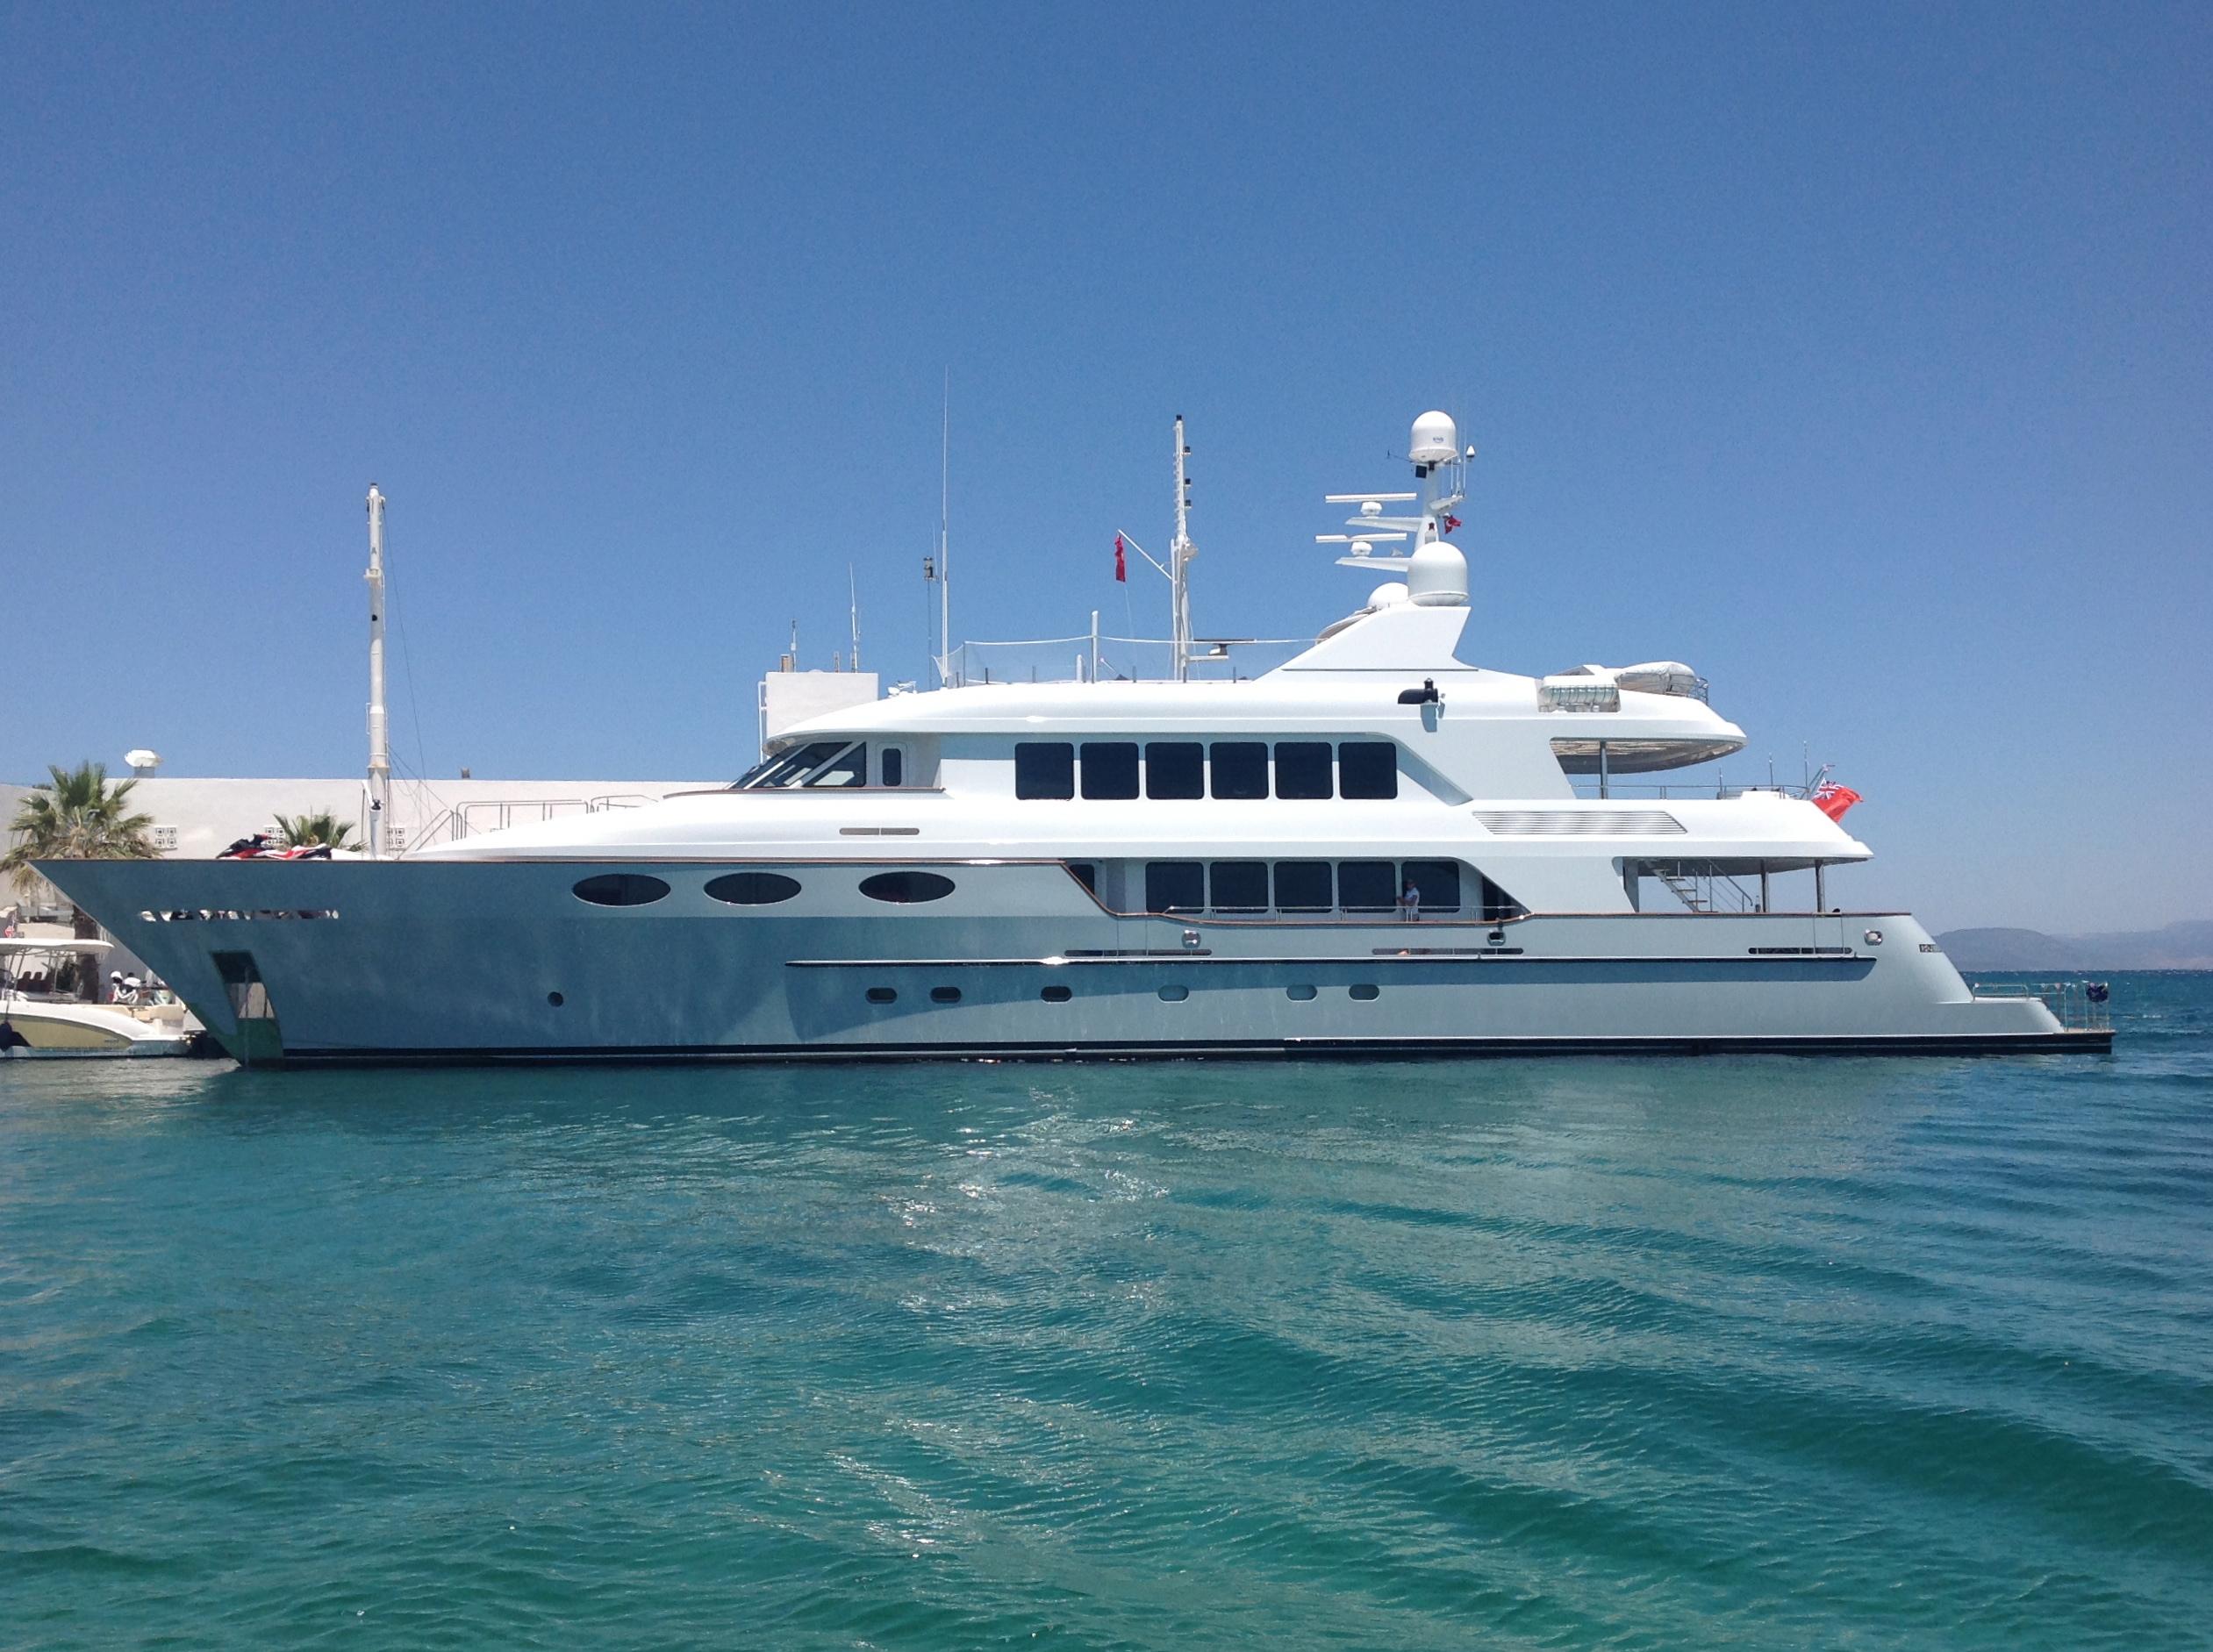 Luxury superyacht keyla interior by hot lab luxury yacht charter - 4hhr